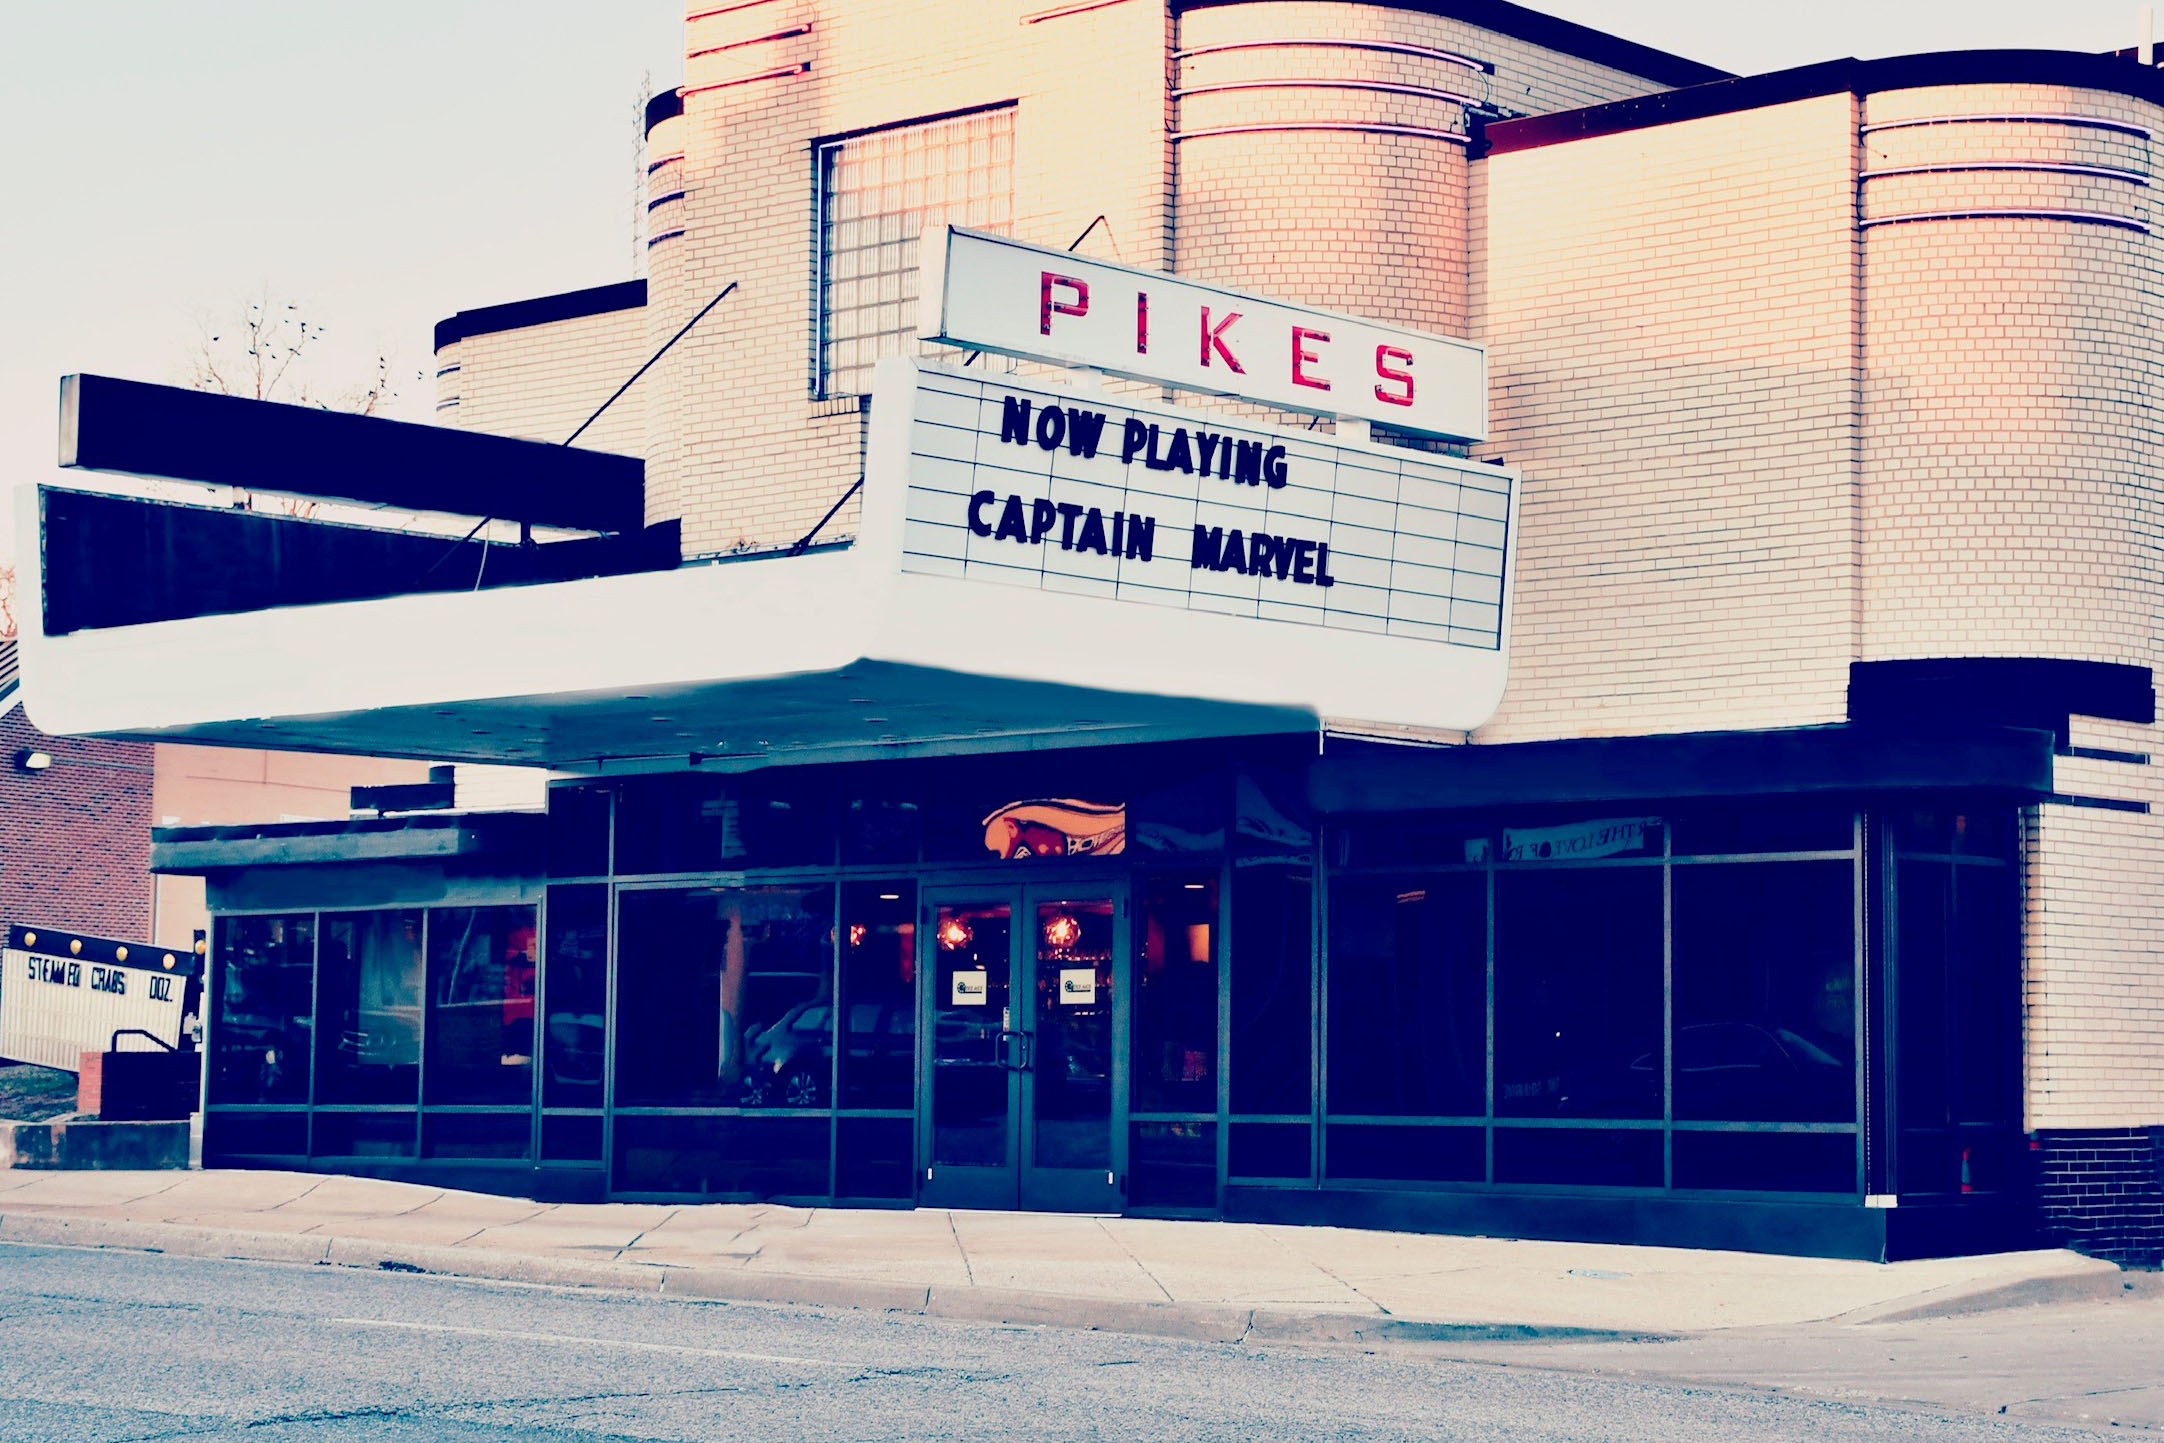 The historic Pikes Theatre